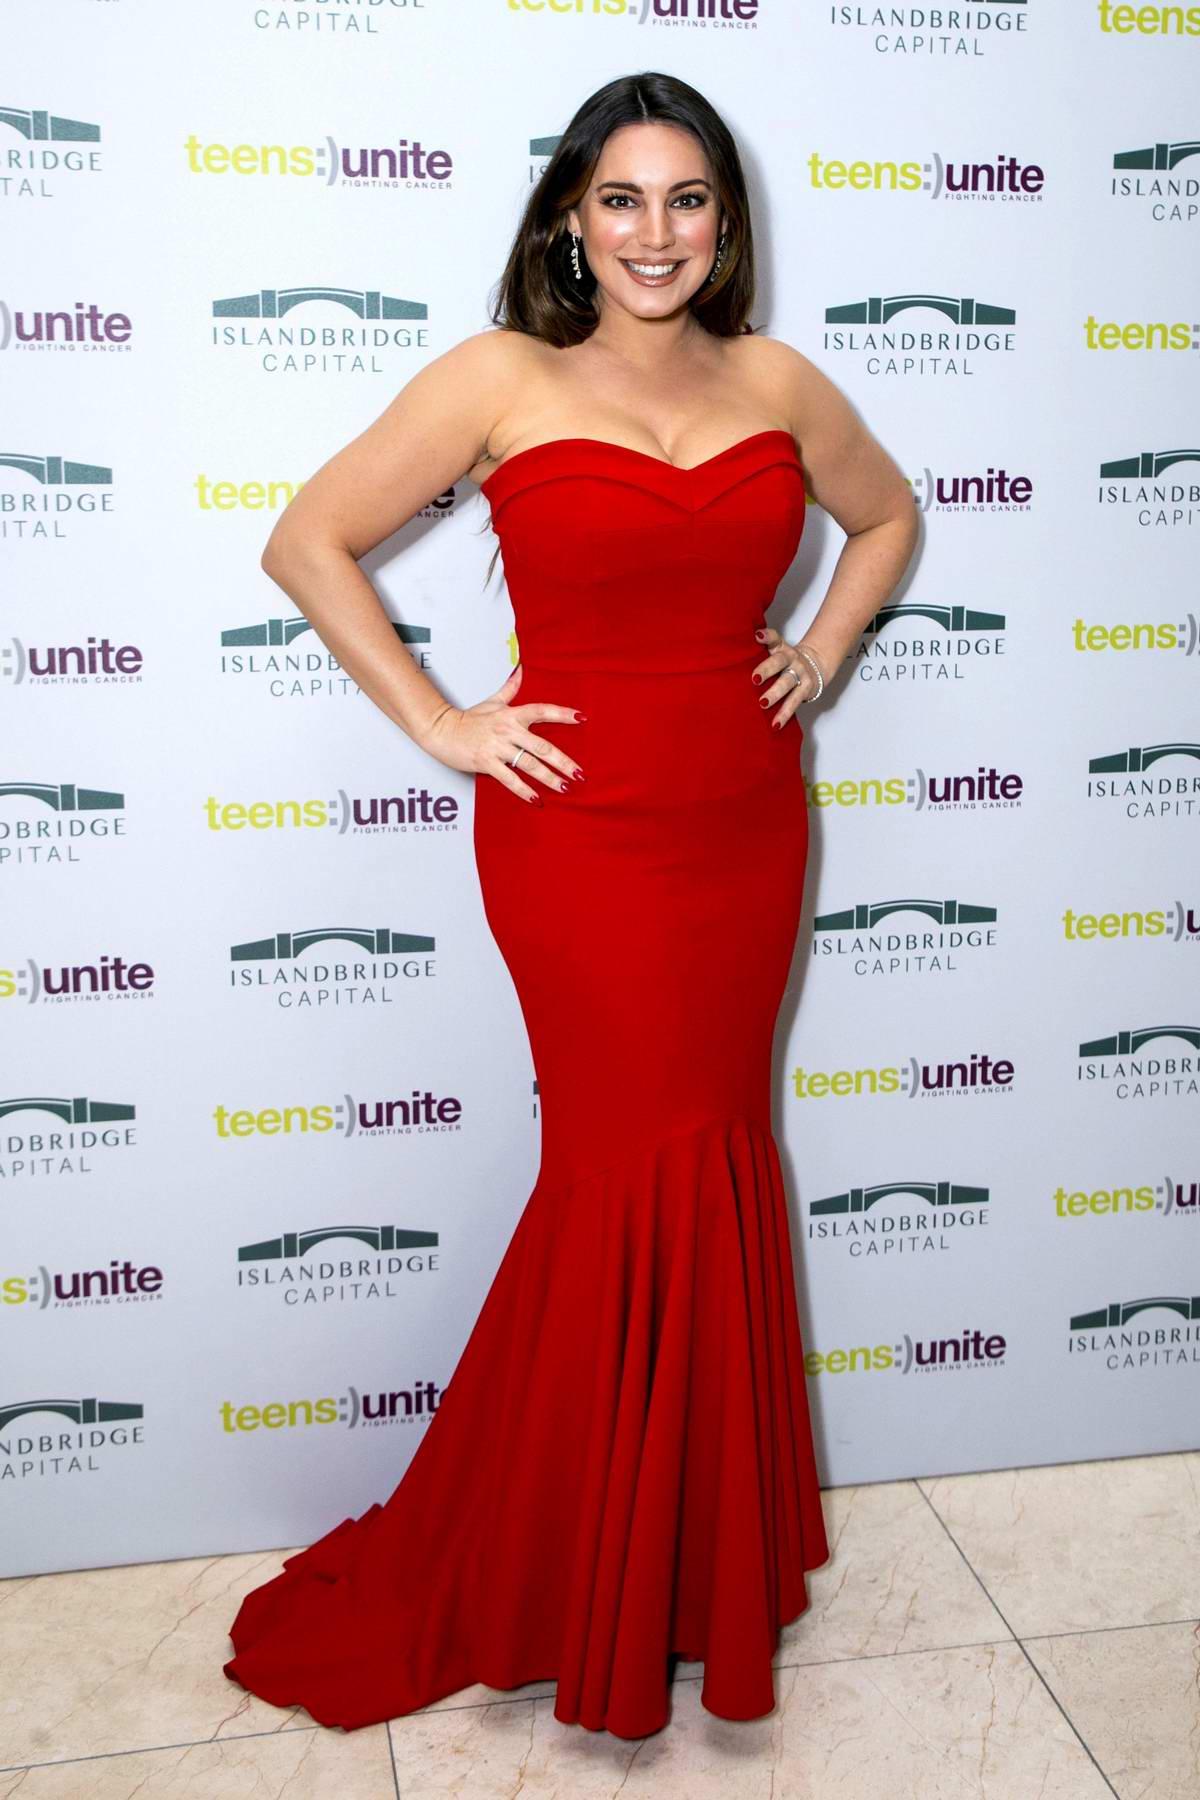 Kelly Brook at Teens Unite - Ten Year Tale Fundraising Gala in London